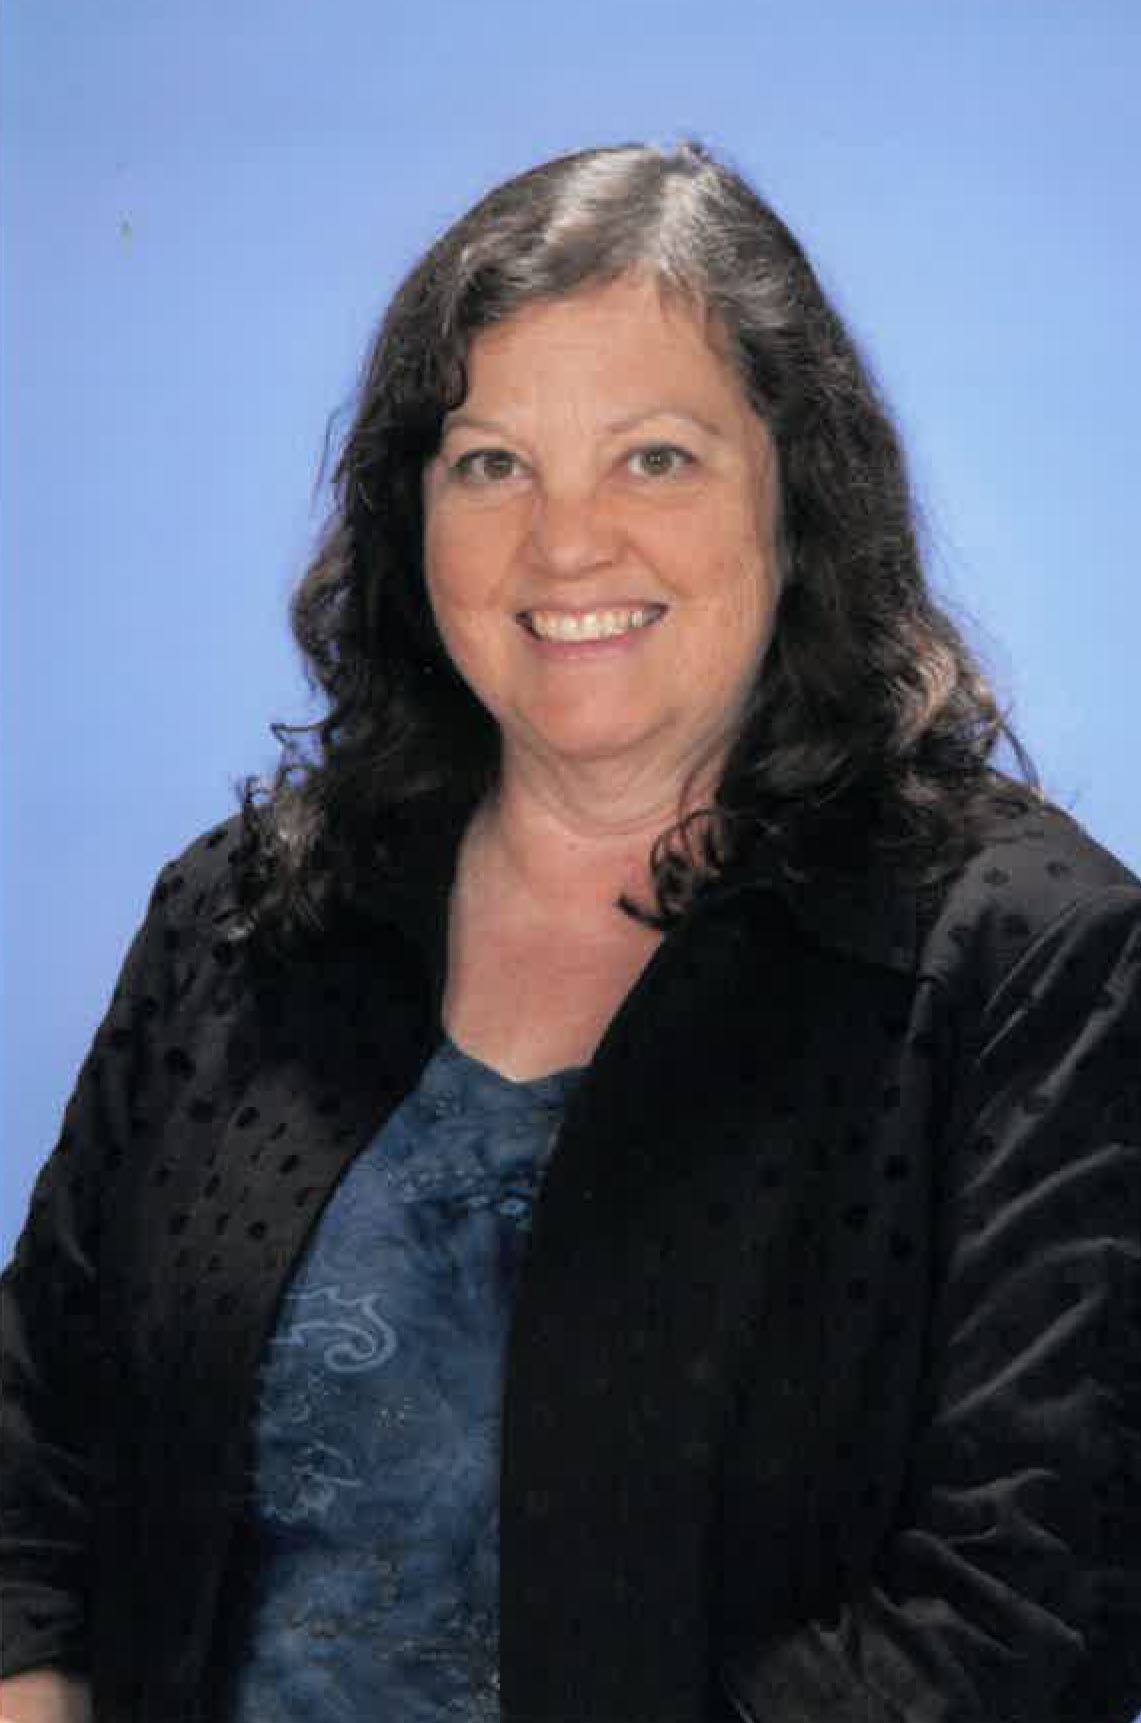 Kathy Brockman